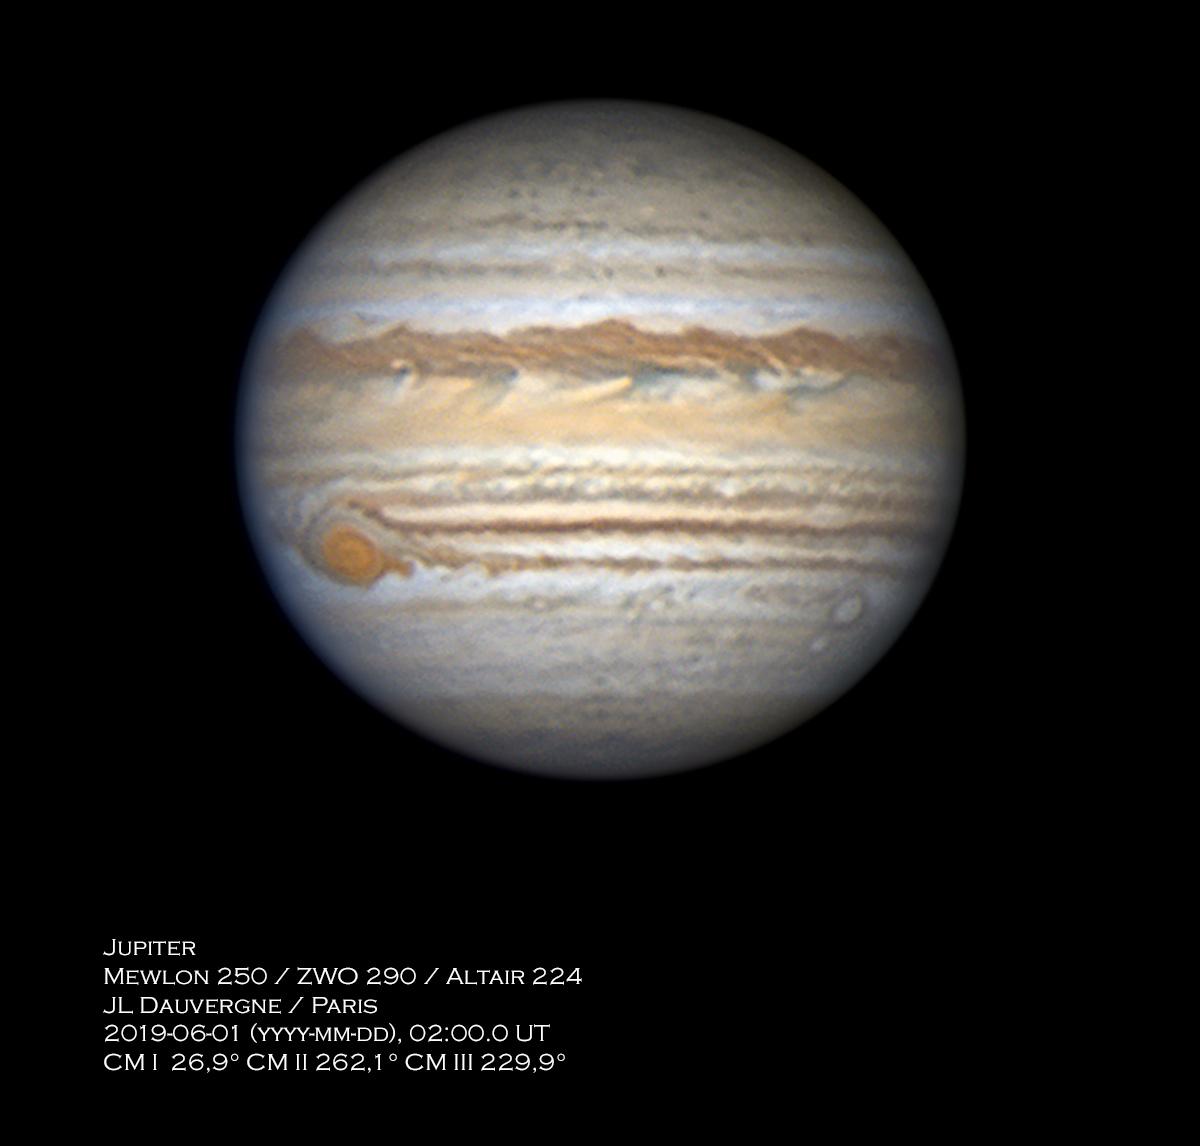 2019-06-01-0200_0-LL-Jupiter_ALTAIRGP224C_lapl6_ap119.png.jpg.5774609f40297f749dbfe938367f44e0.jpg